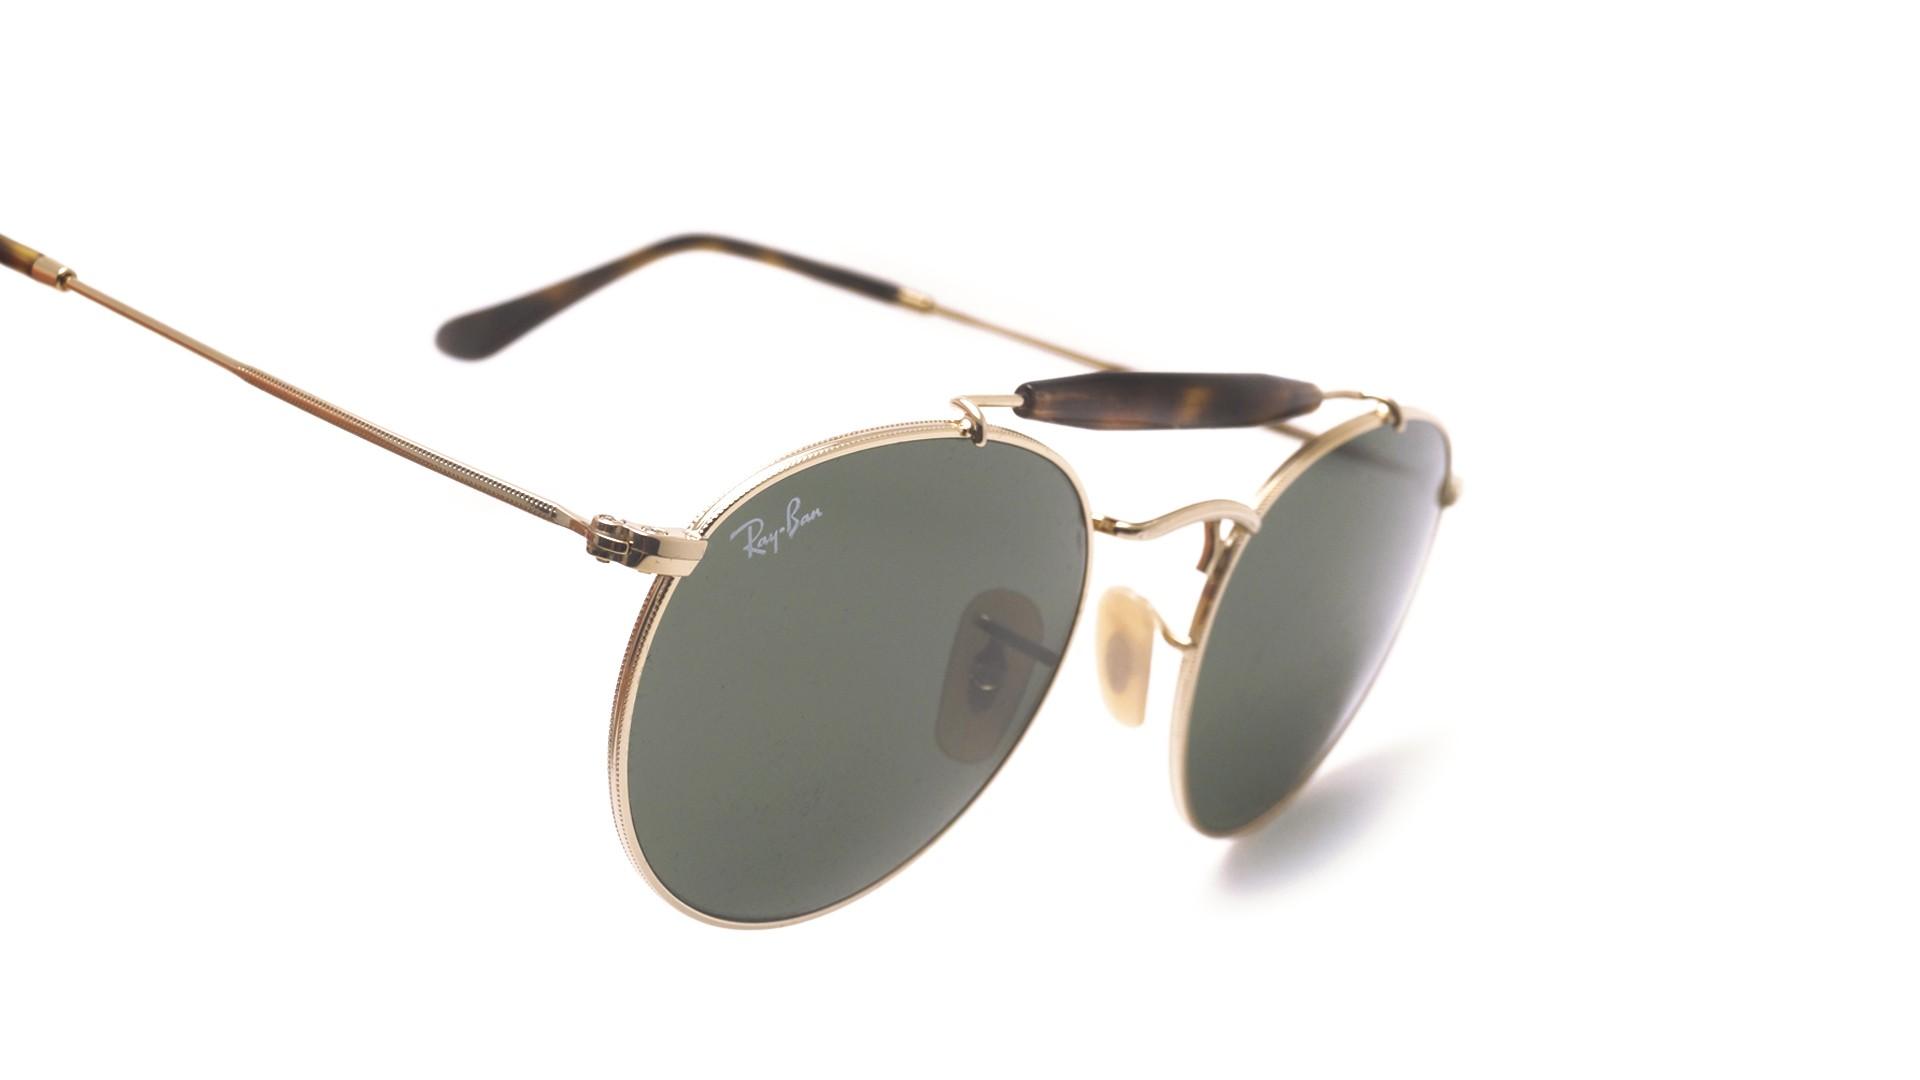 a3239ca232 Sunglasses Ray-Ban RB3747 001 50-21 Gold G-15 Medium